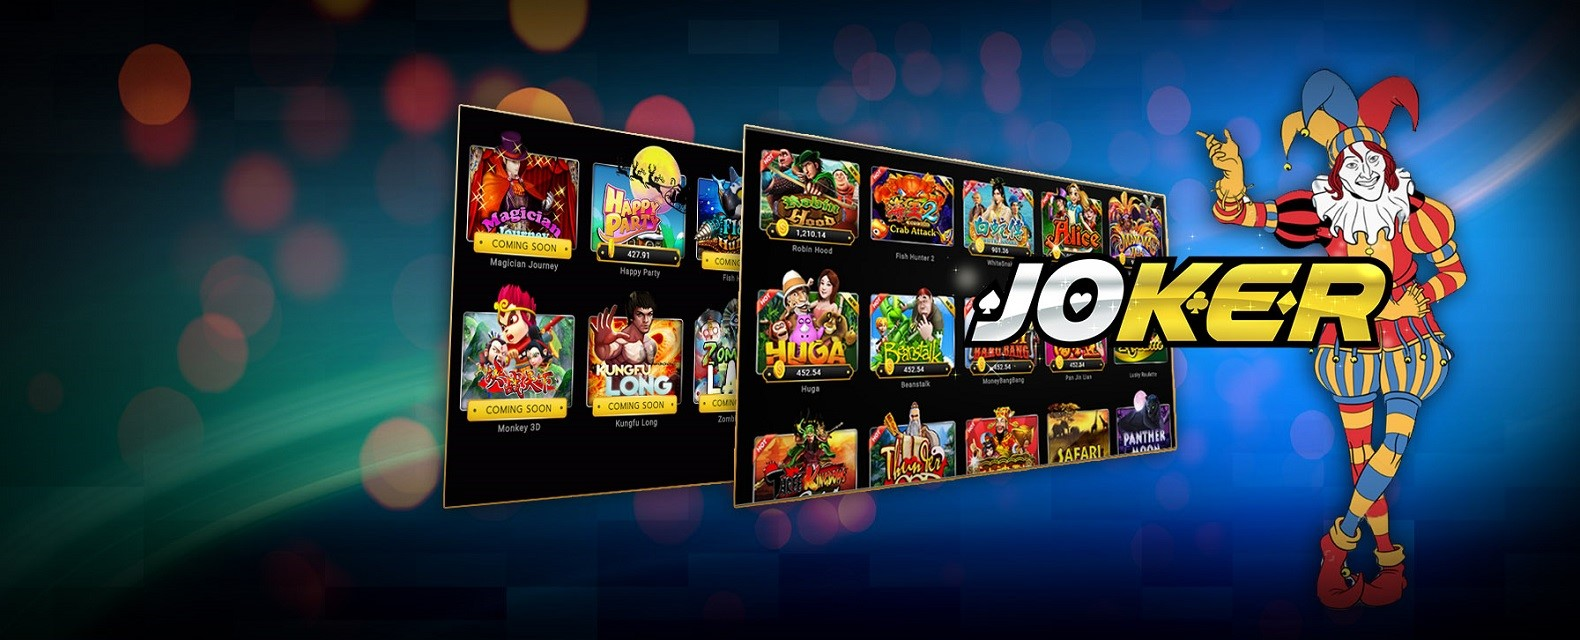 Go To The Joker Slots Websites For Additional Information